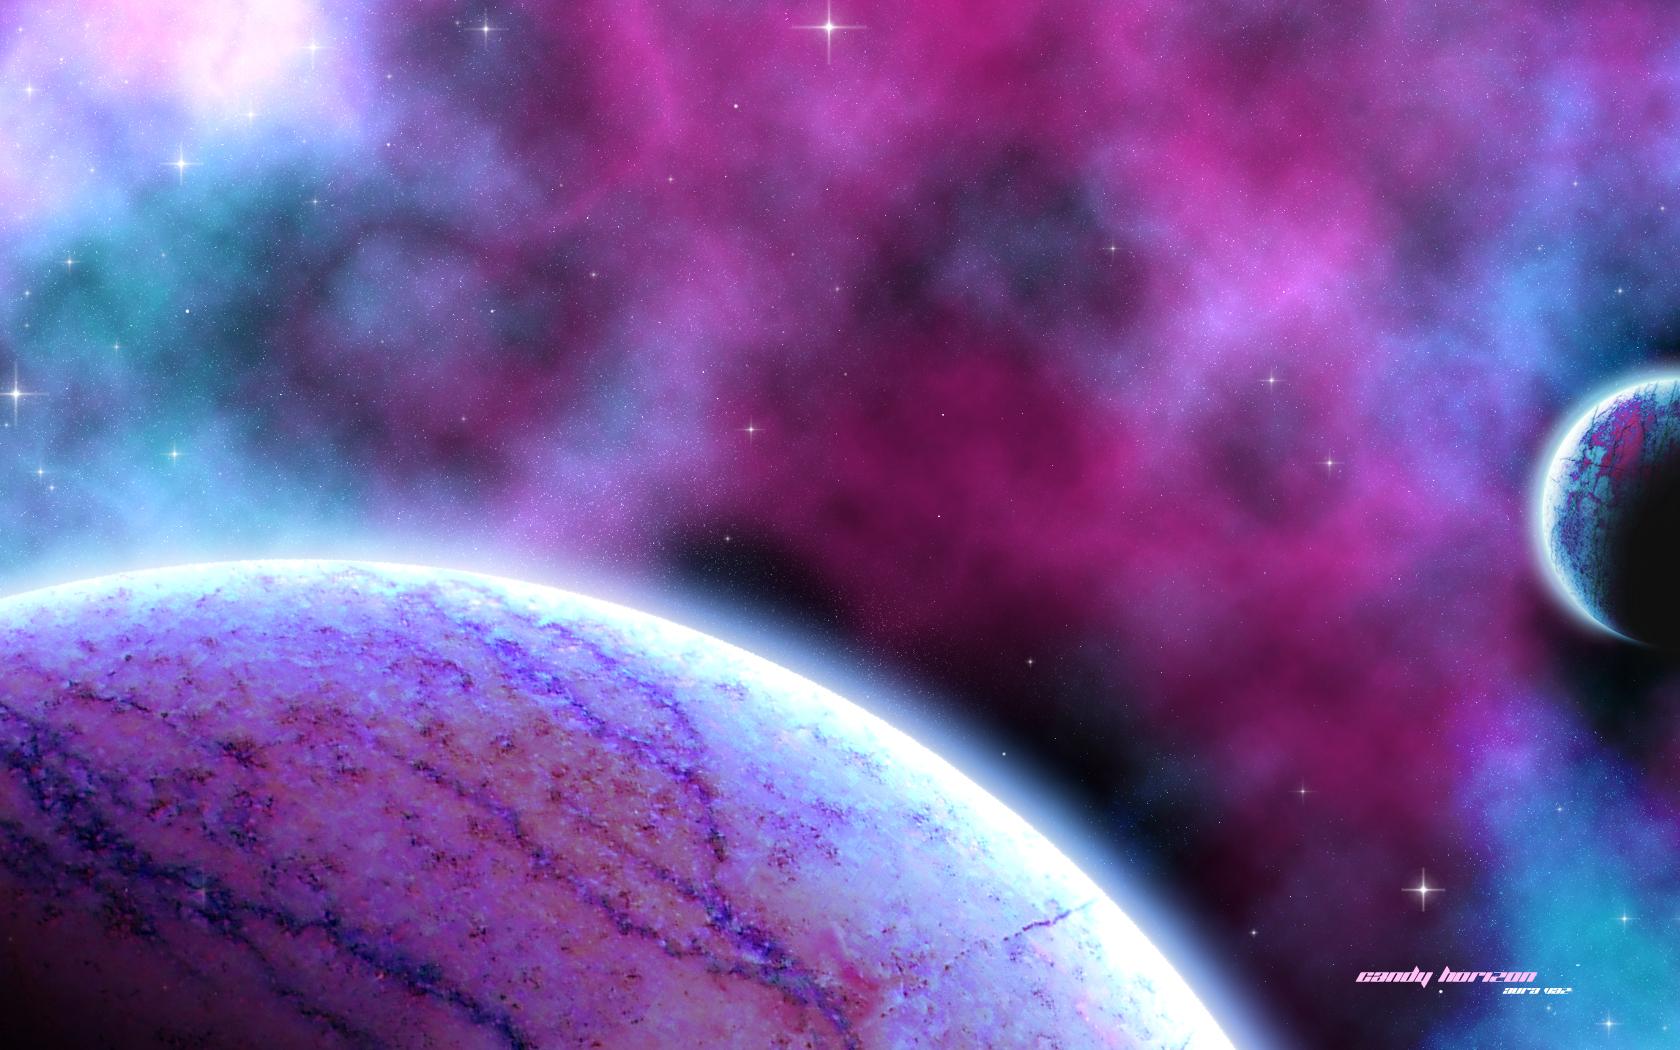 Para quem gosta de space art (meus:P) Candy_horizon_wallpaper_by_auravaz-d30mtio